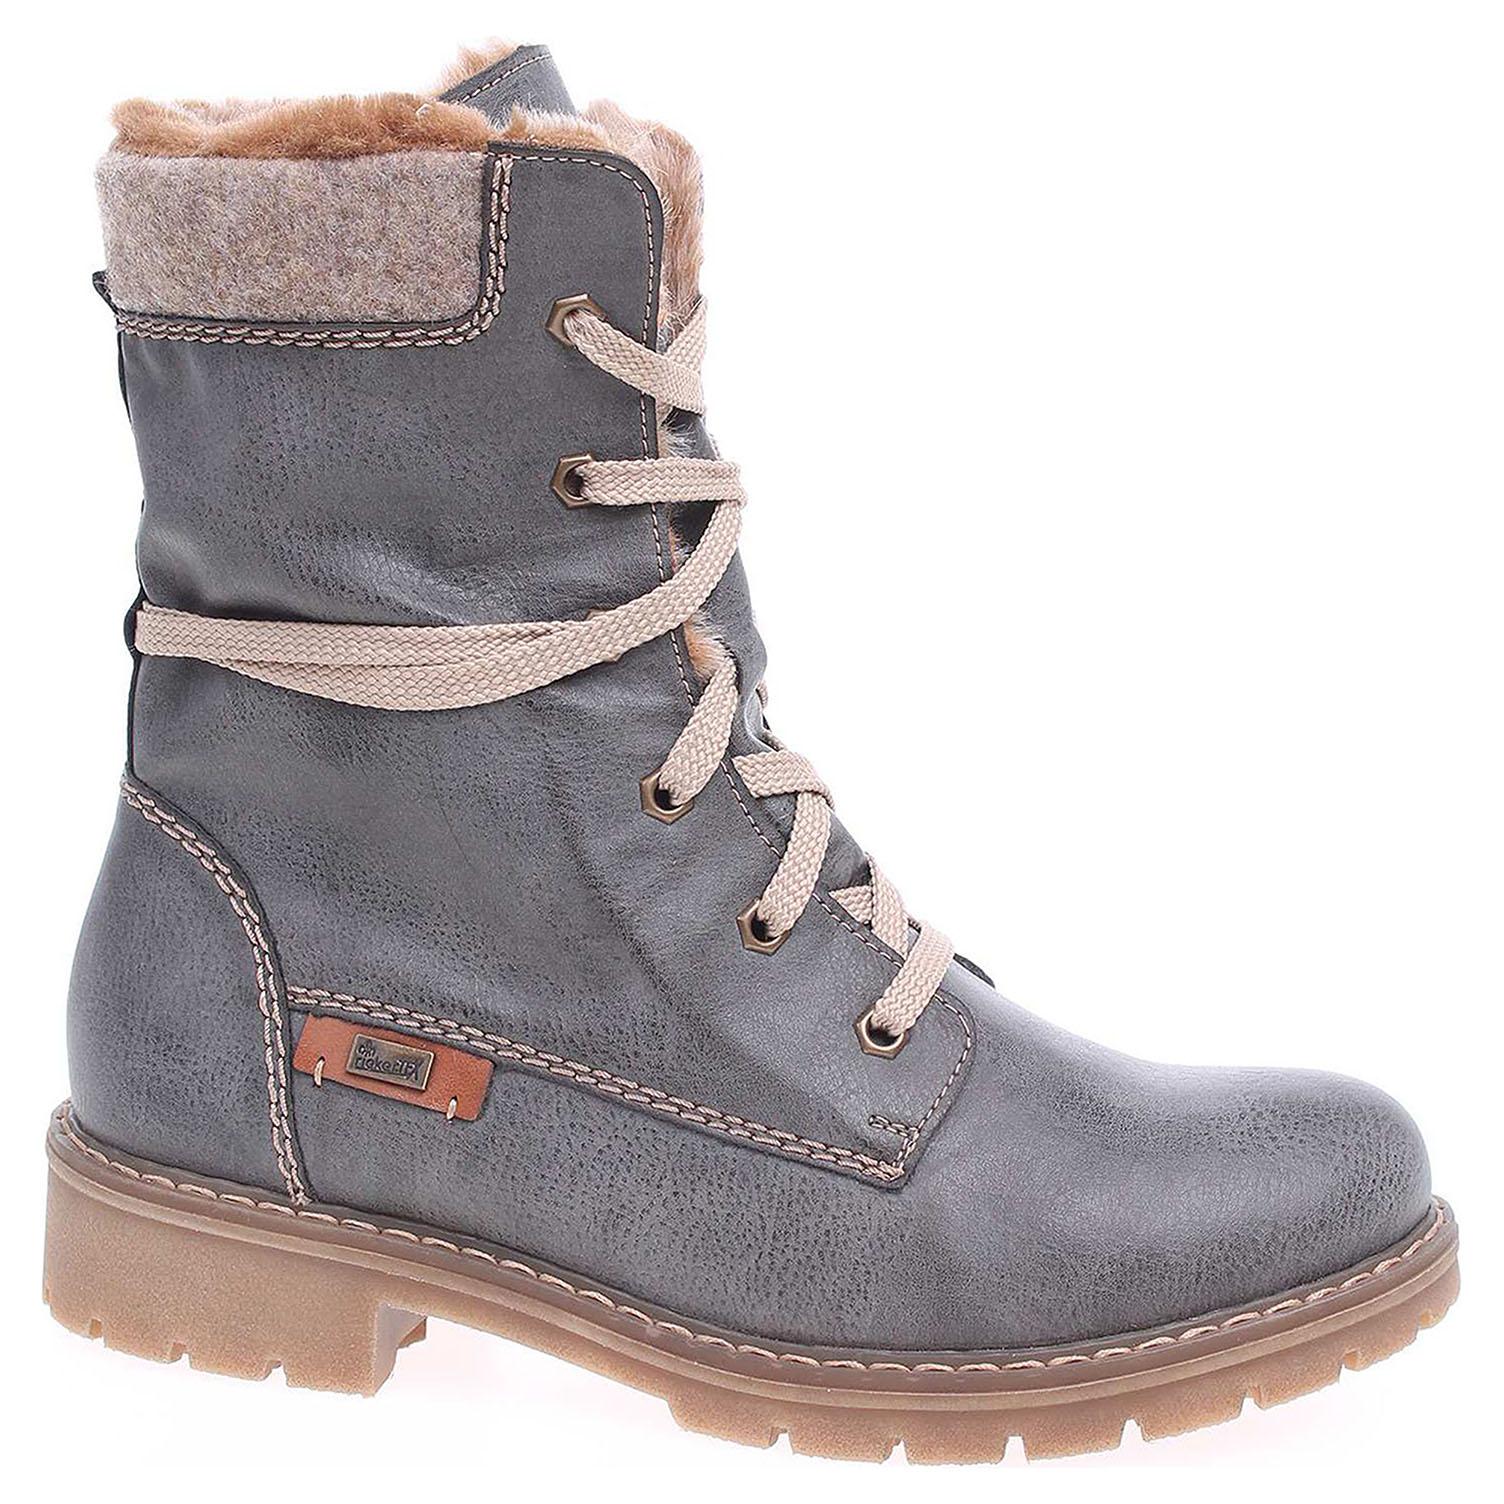 04859a3de3 detail Dámska členkové topánky Rieker Y9122-45 grau kombi